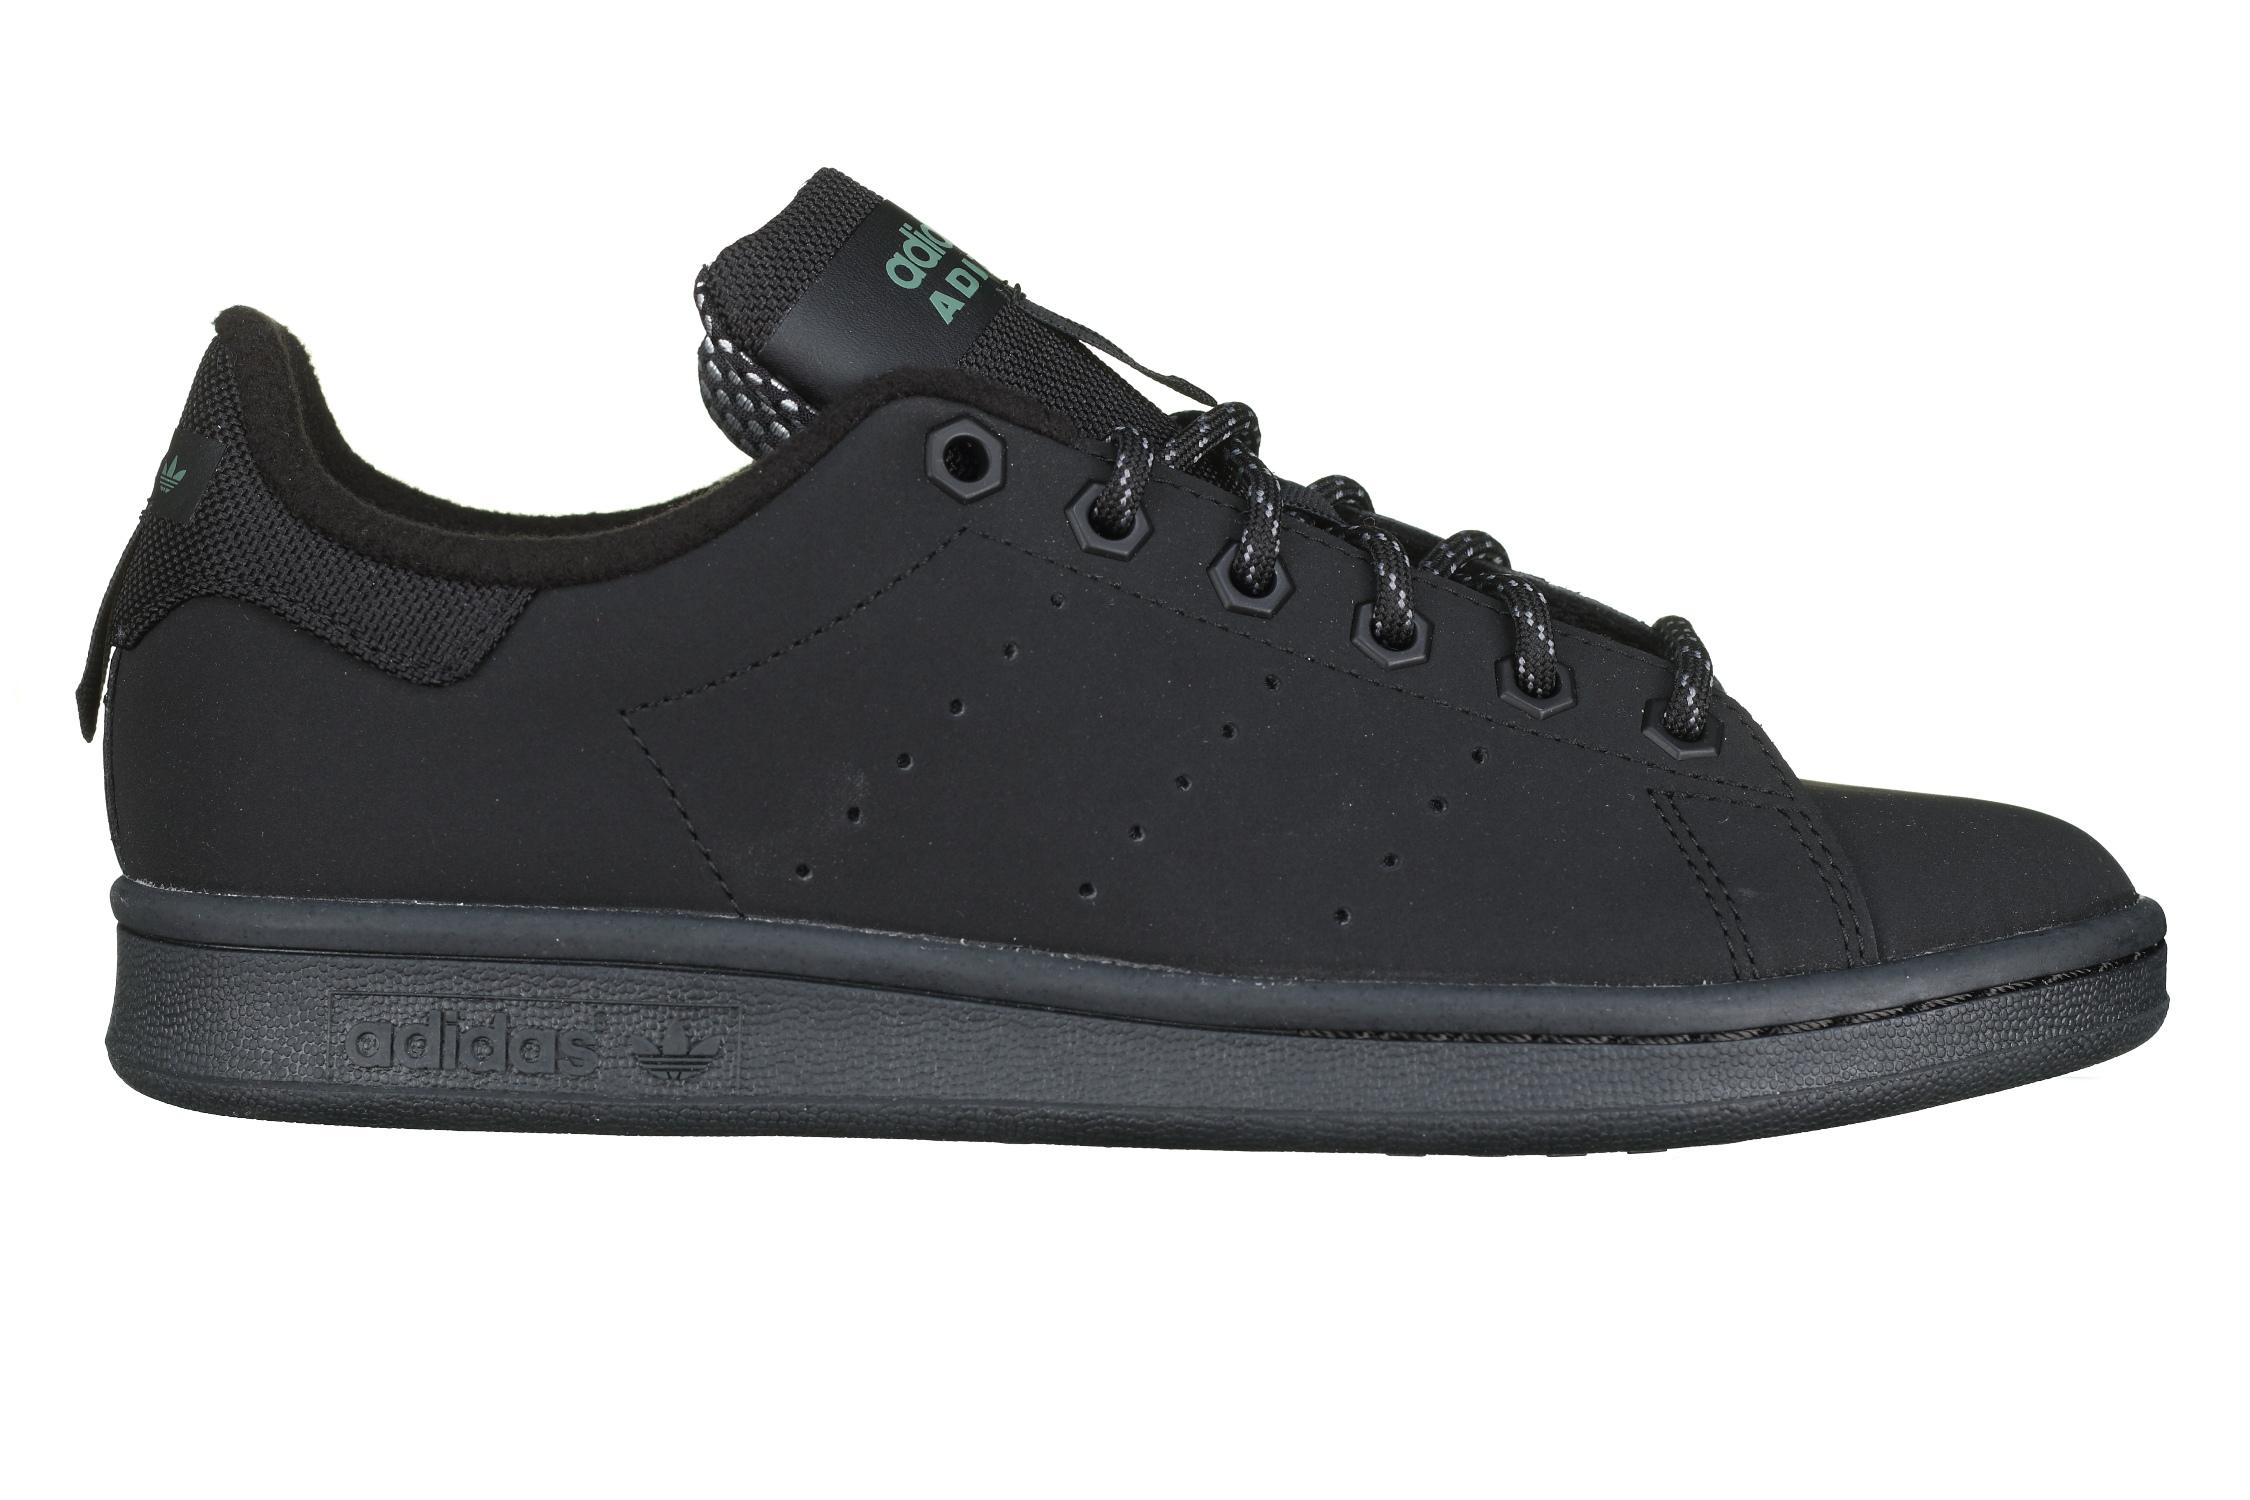 https://www.leadermode.com/184037/adidas-stan-smith-fv4641-noir.jpg